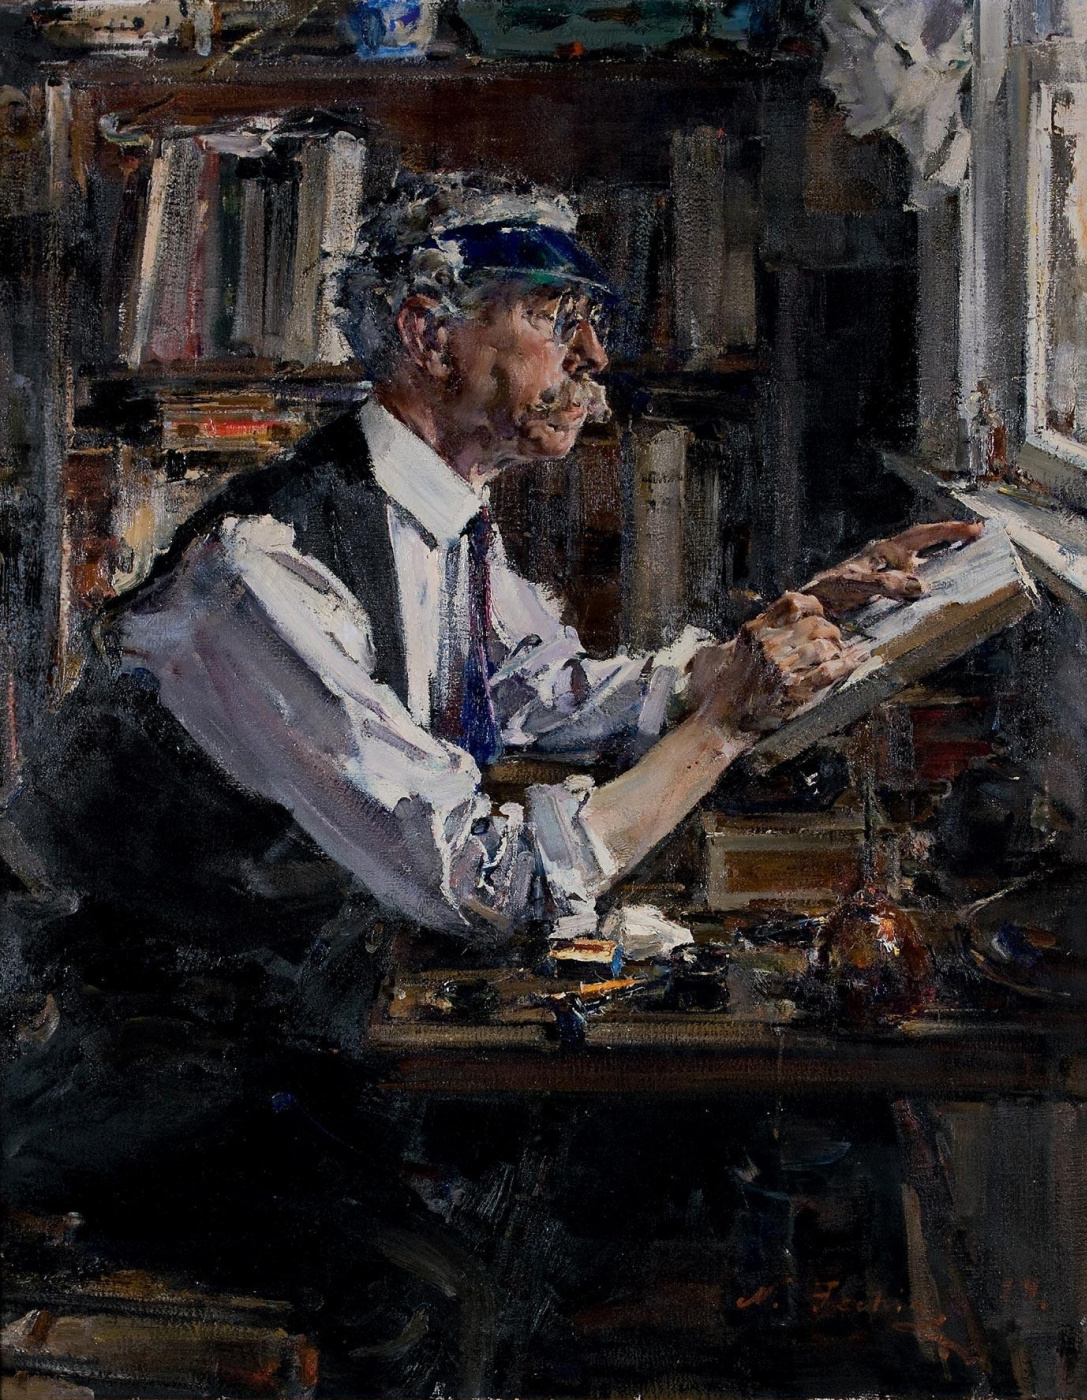 Nikolay Feshin. Portrait of the Engraver William D. Watt